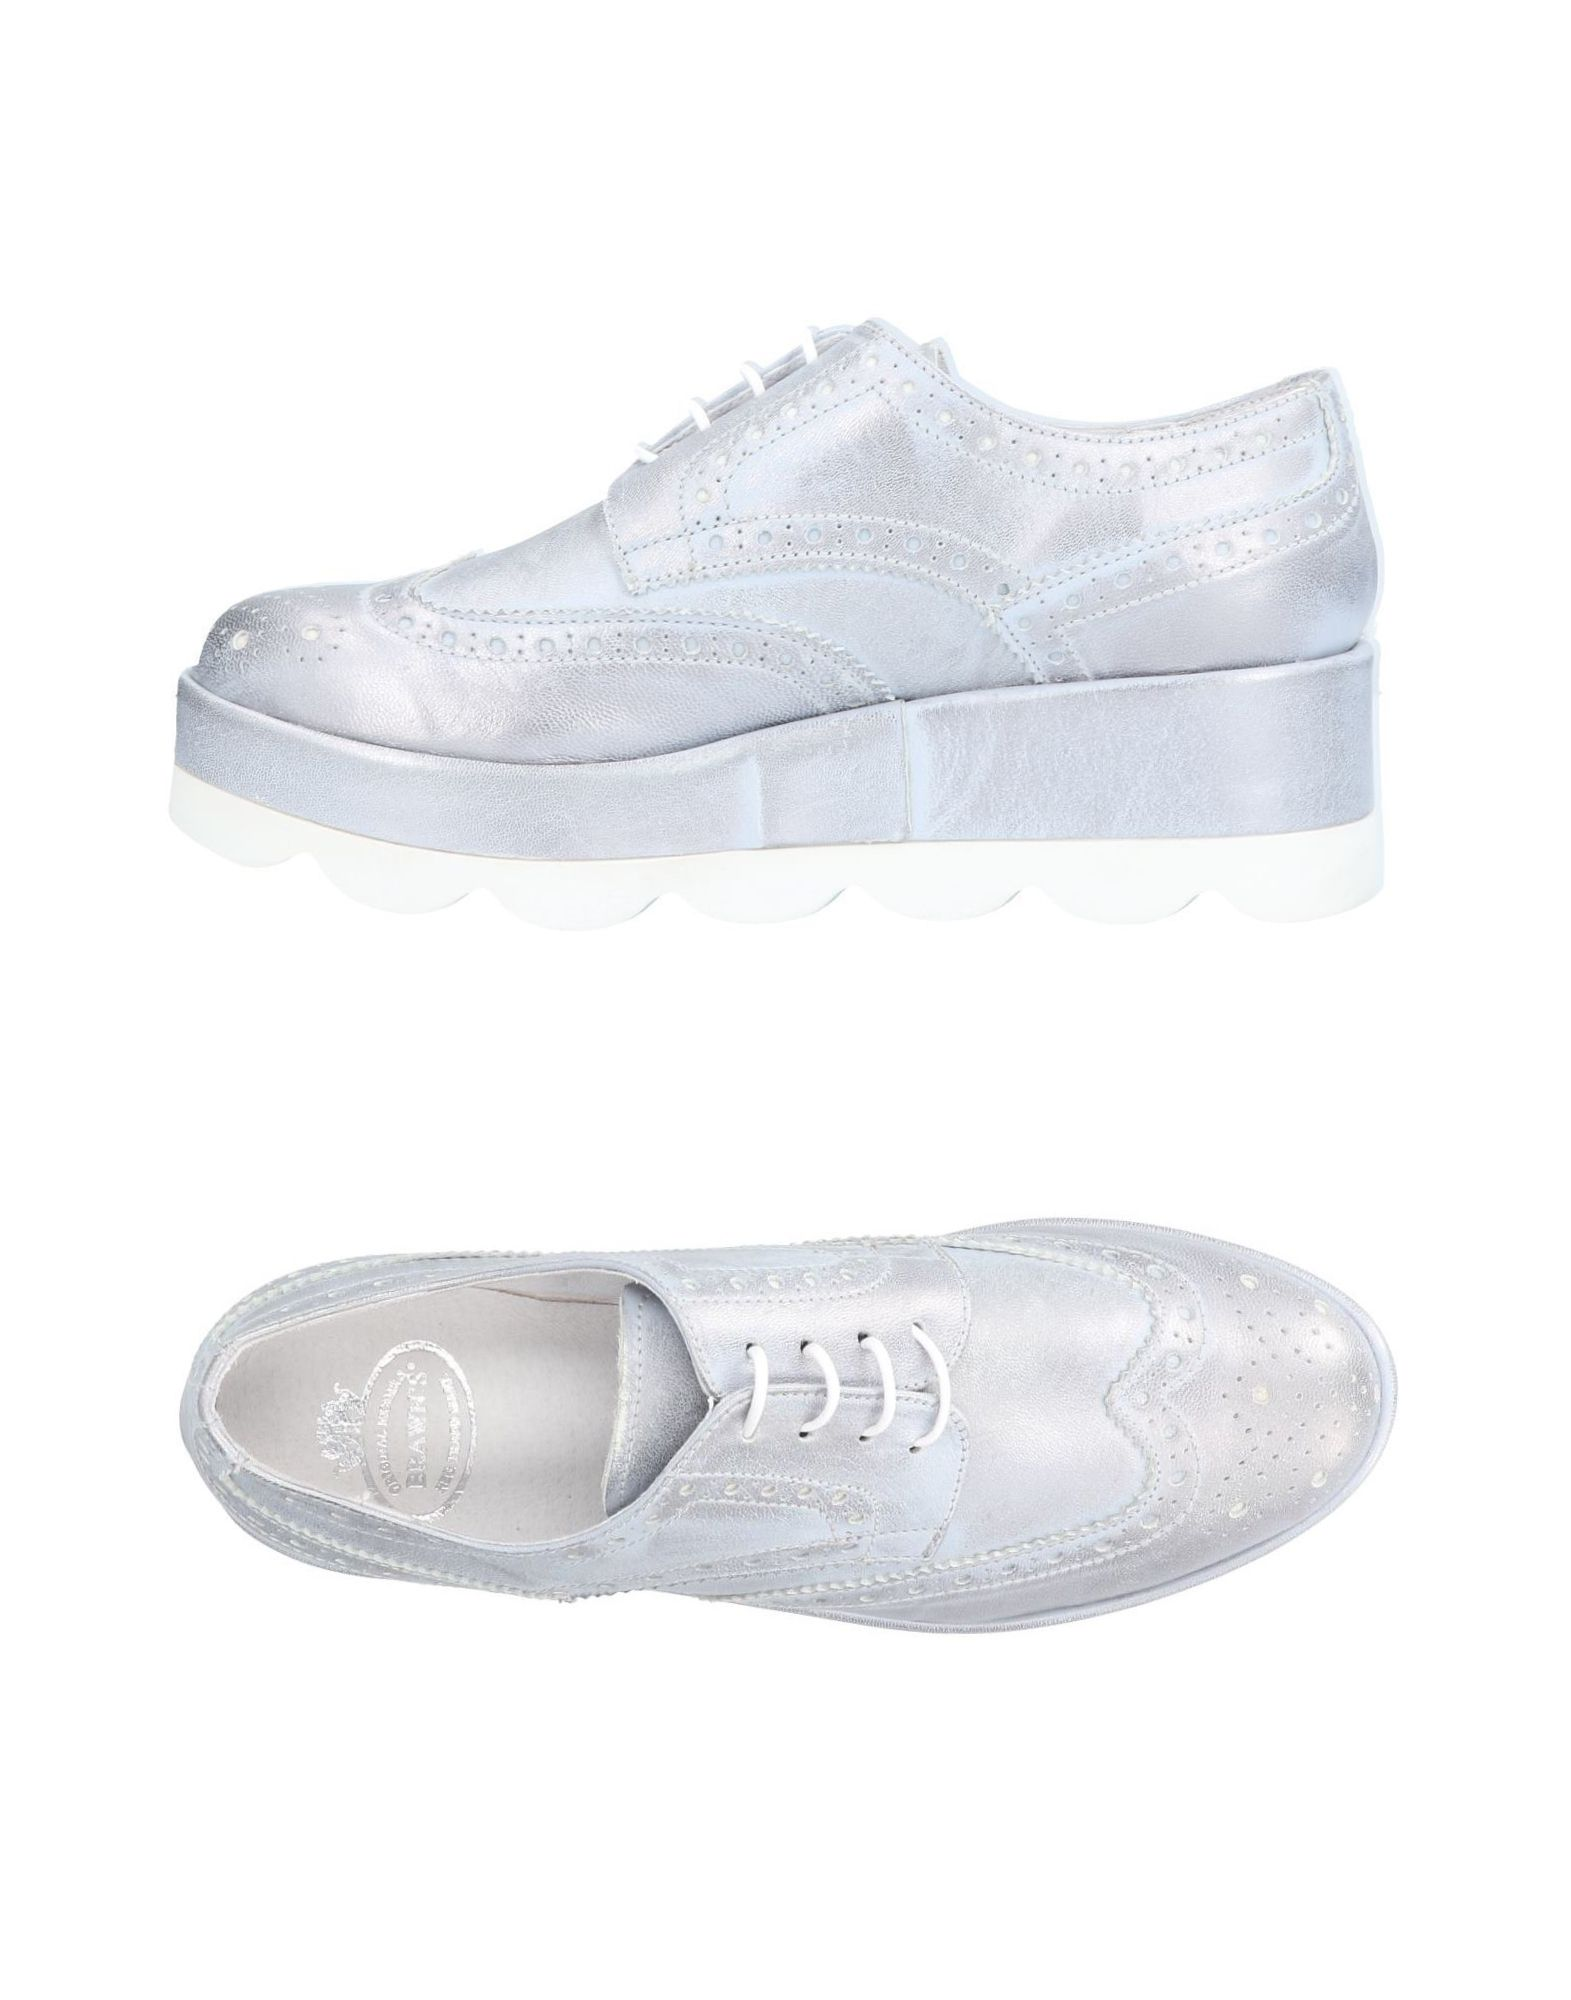 Brawn's Schnürschuhe Damen  11411903NP Gute Qualität beliebte Schuhe